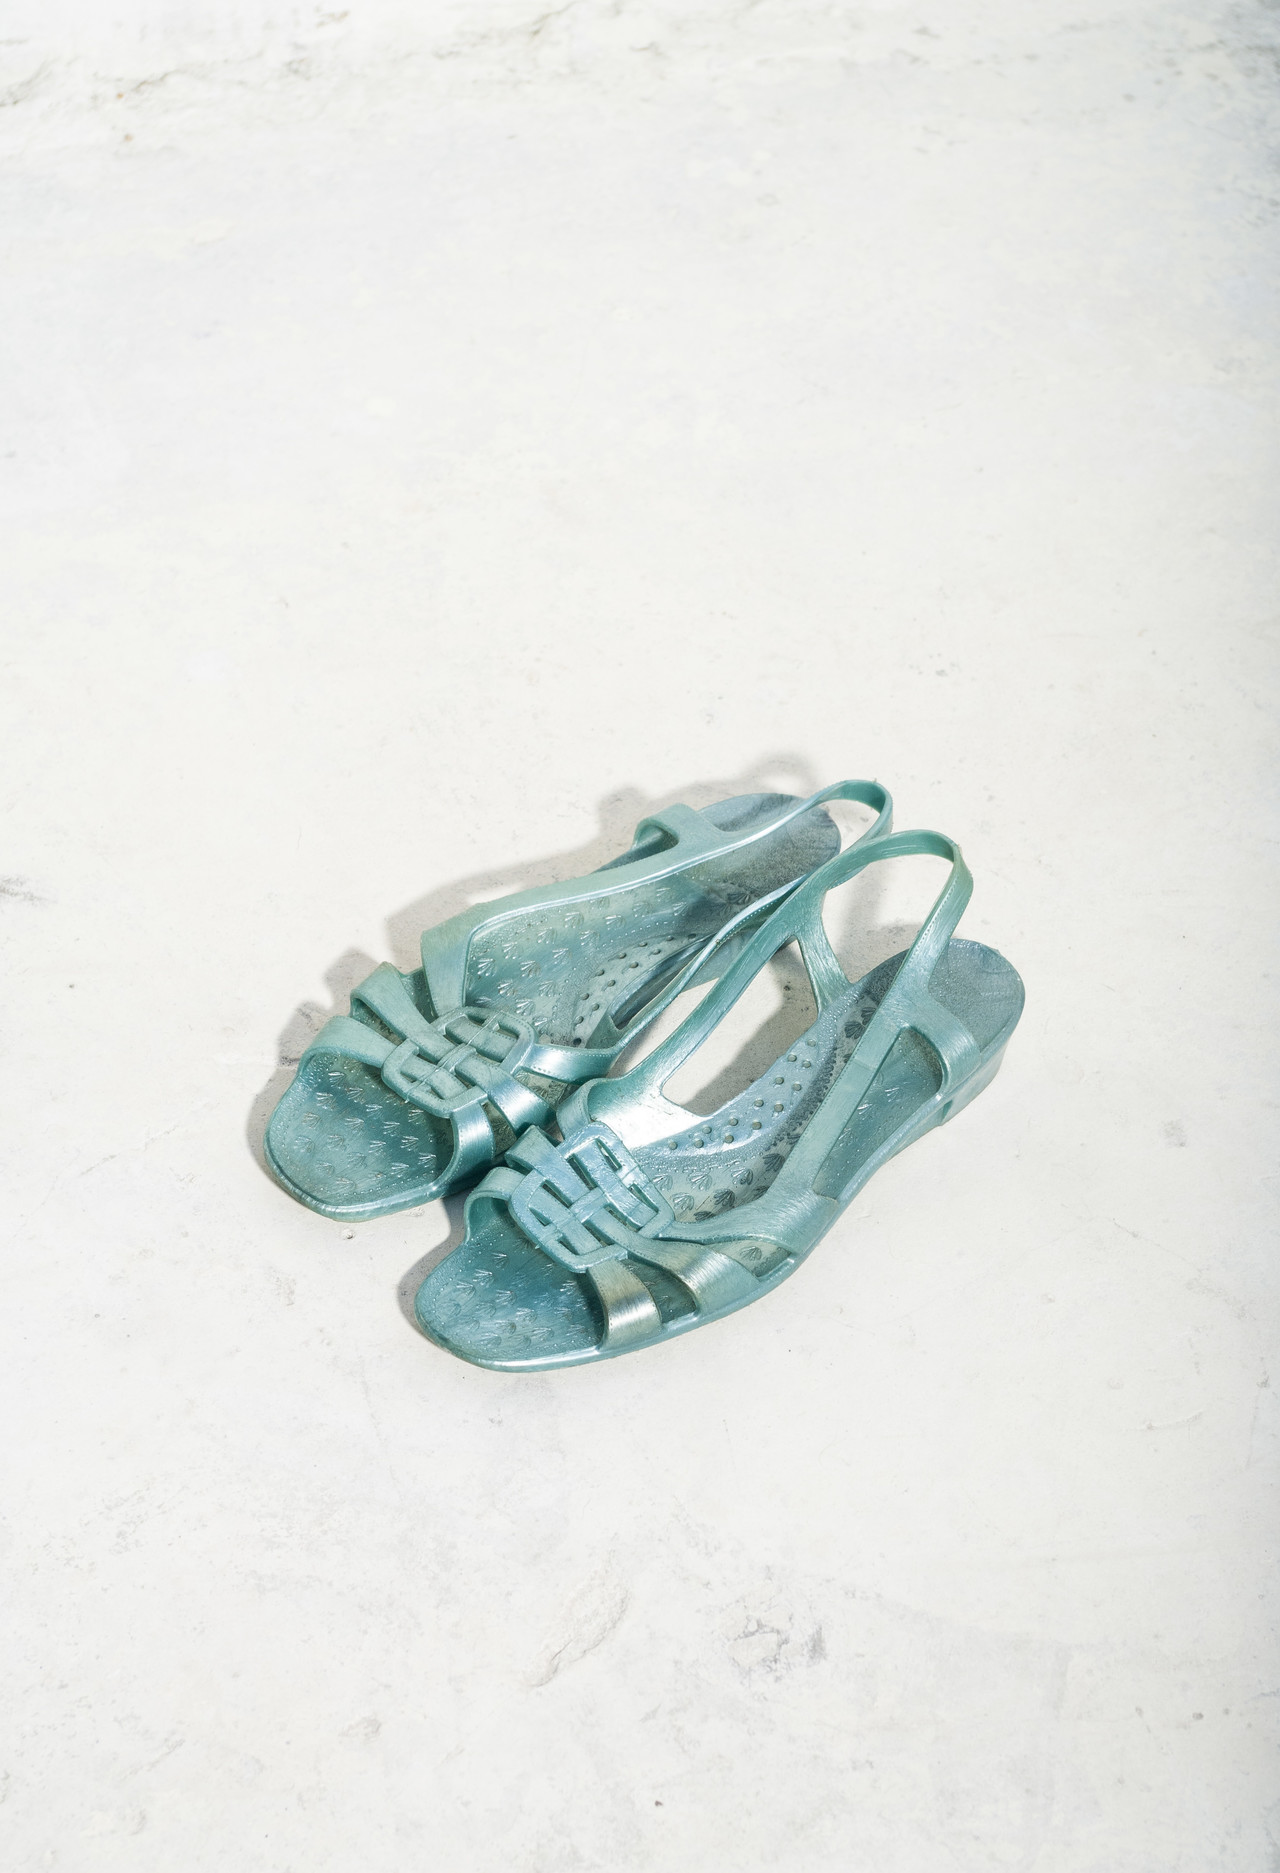 8c6cc55e0ea 80s blue jelly sandals